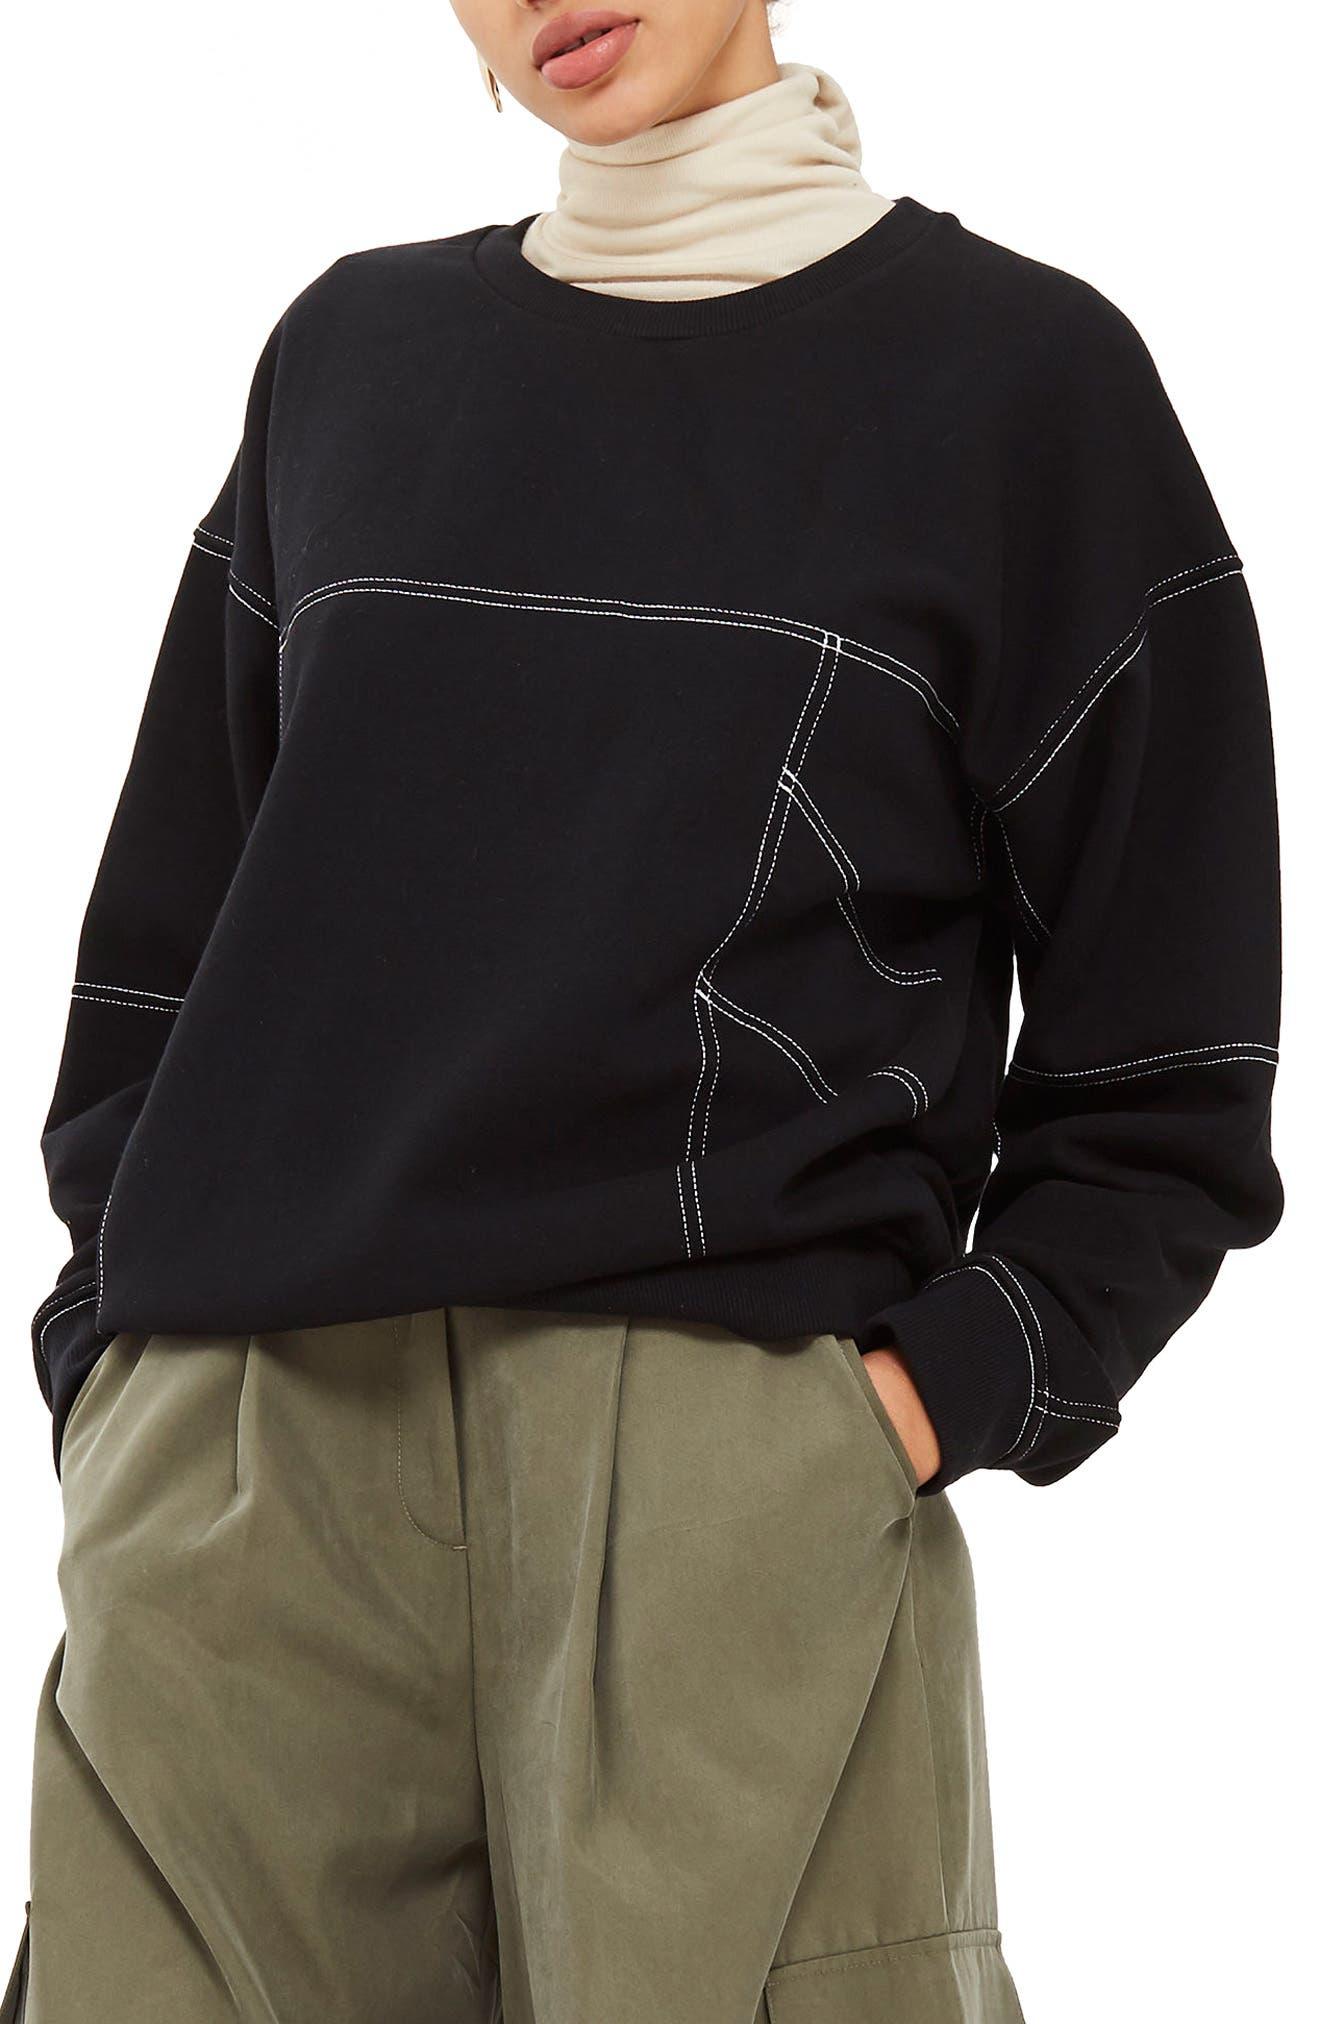 Stab Stitch Detail Sweatshirt,                         Main,                         color, 001